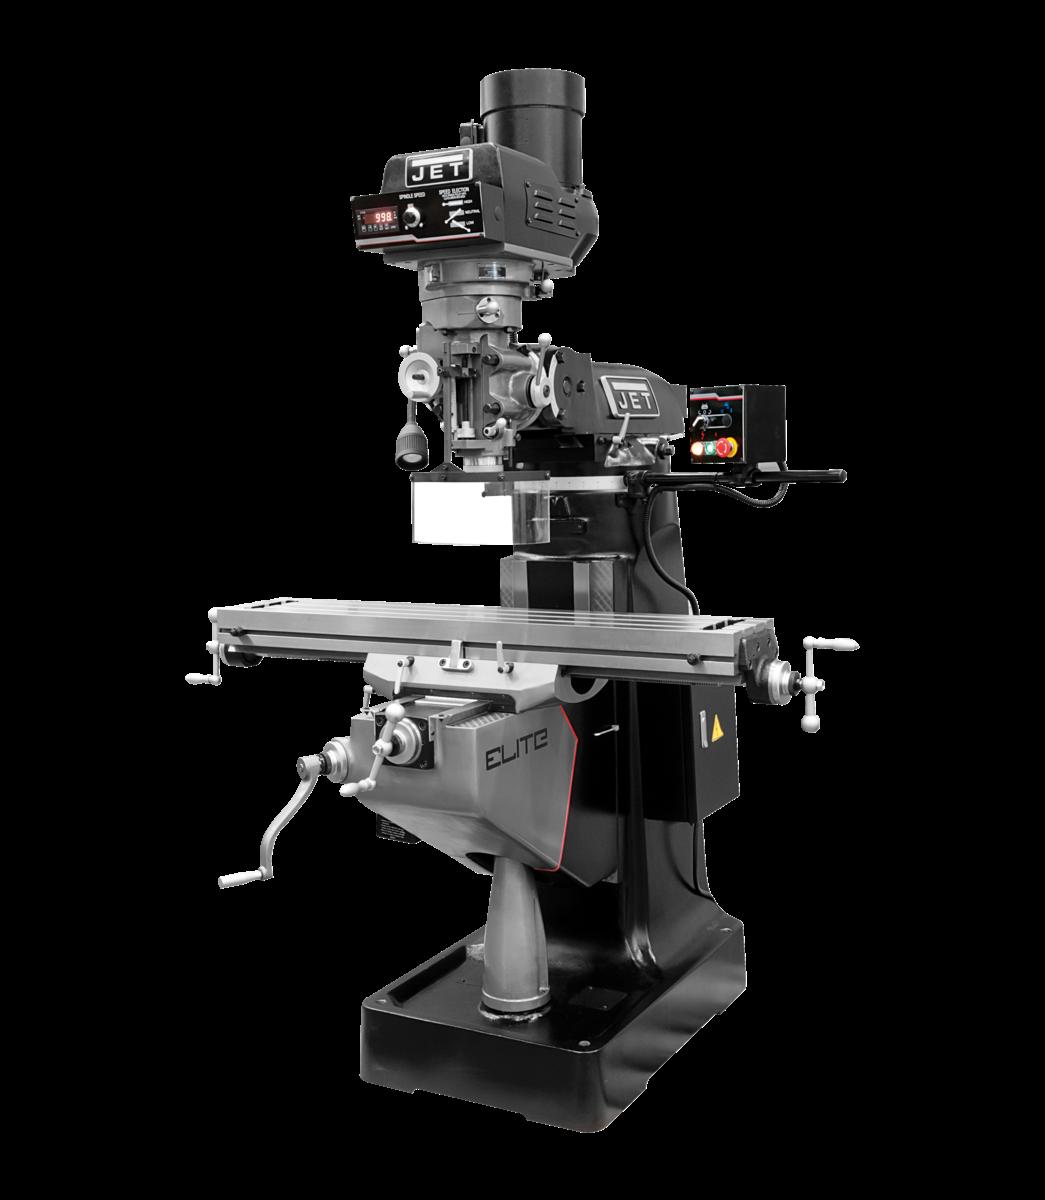 EVS-949 Mill with Servo X-Axis Powerfeed